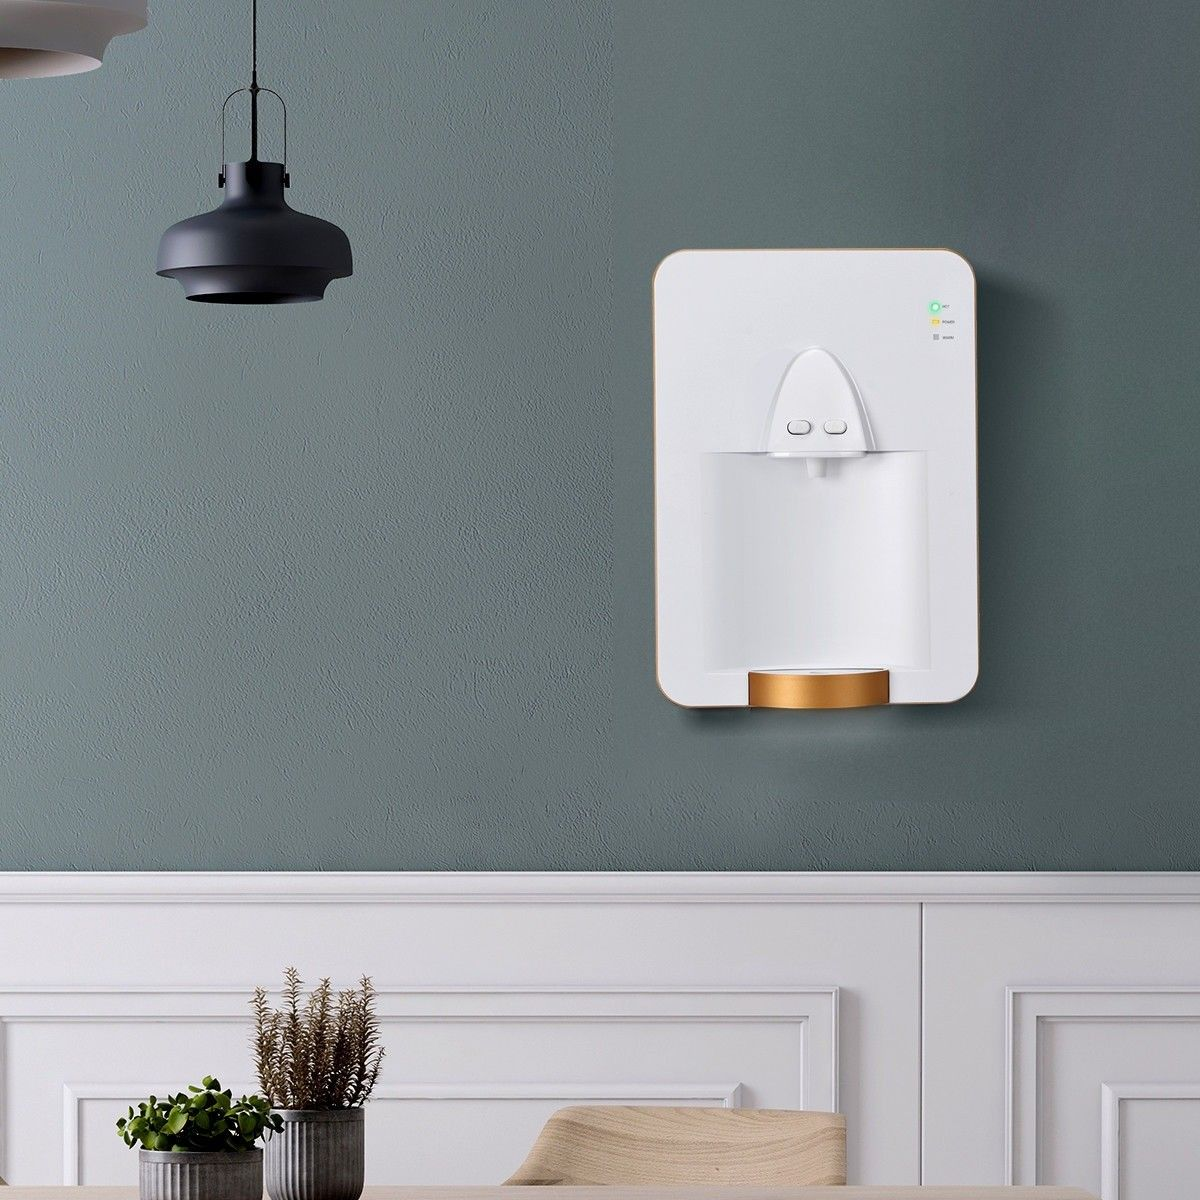 Wall Mounted Electric Tank Water Dispenser With Removable Drip Tray Water Dispenser Drip Tray Electric Heating